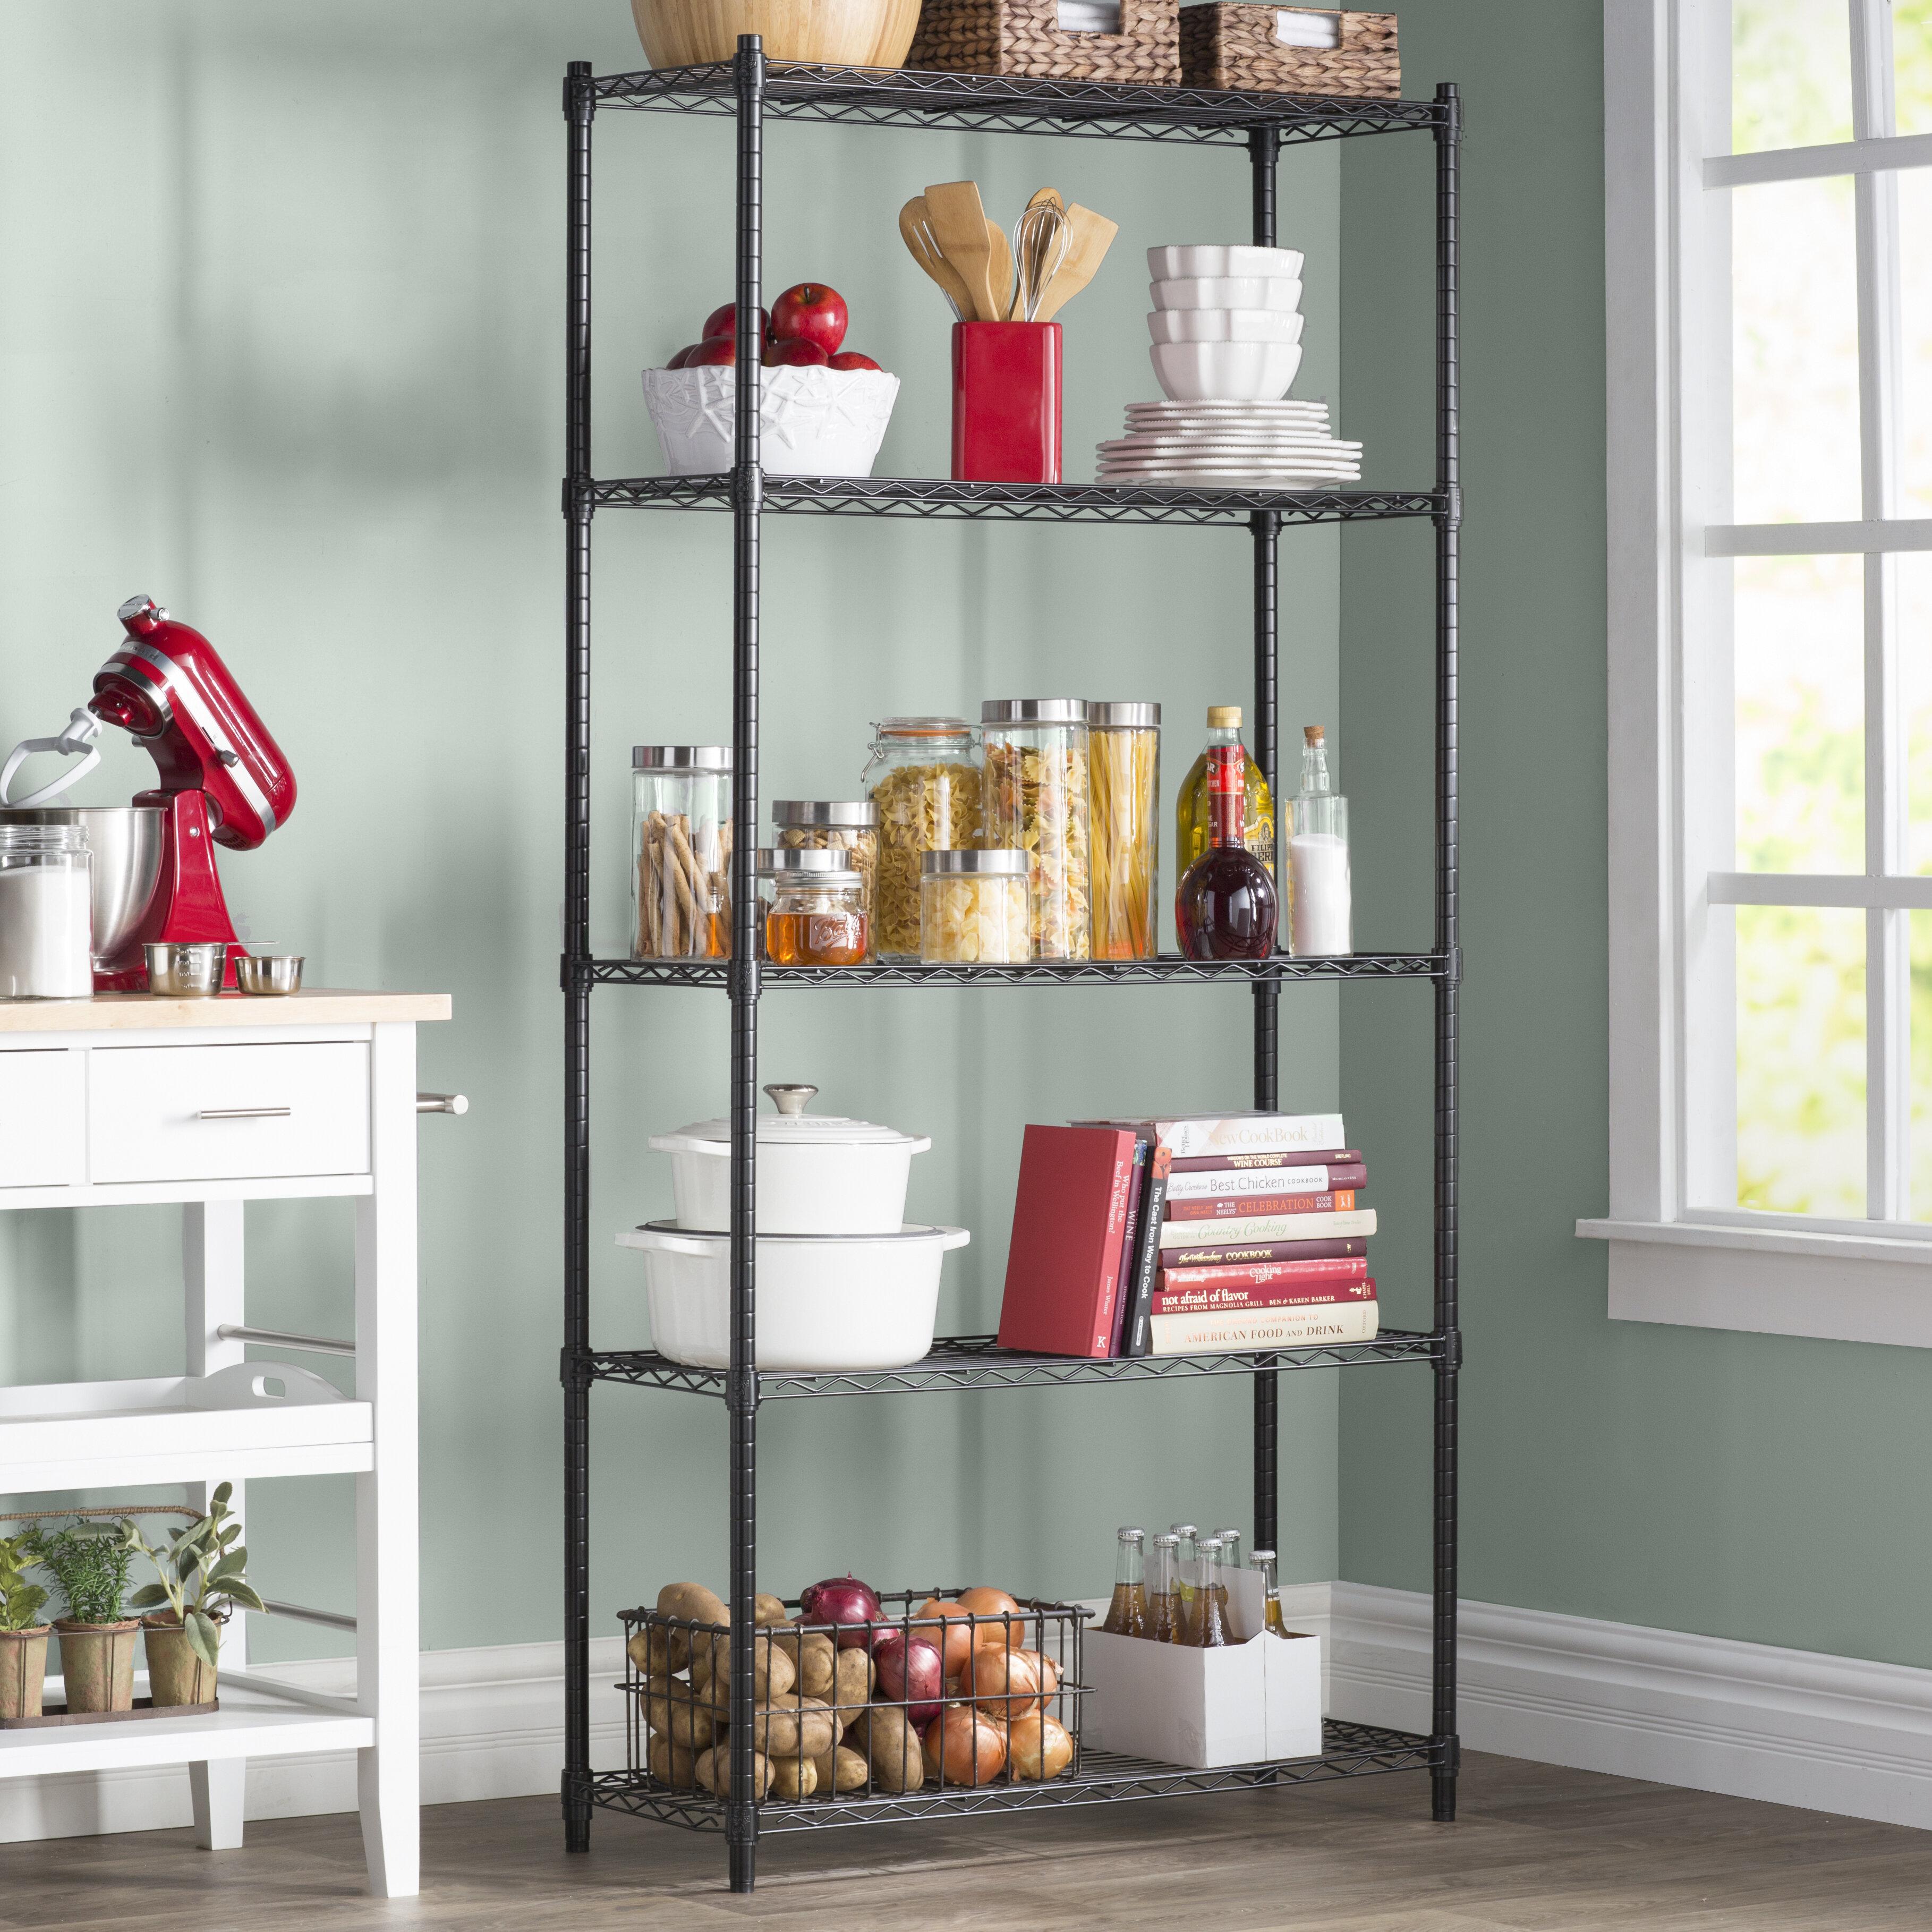 with children gateway front products props view ladder chocolate shelf picture delta dark